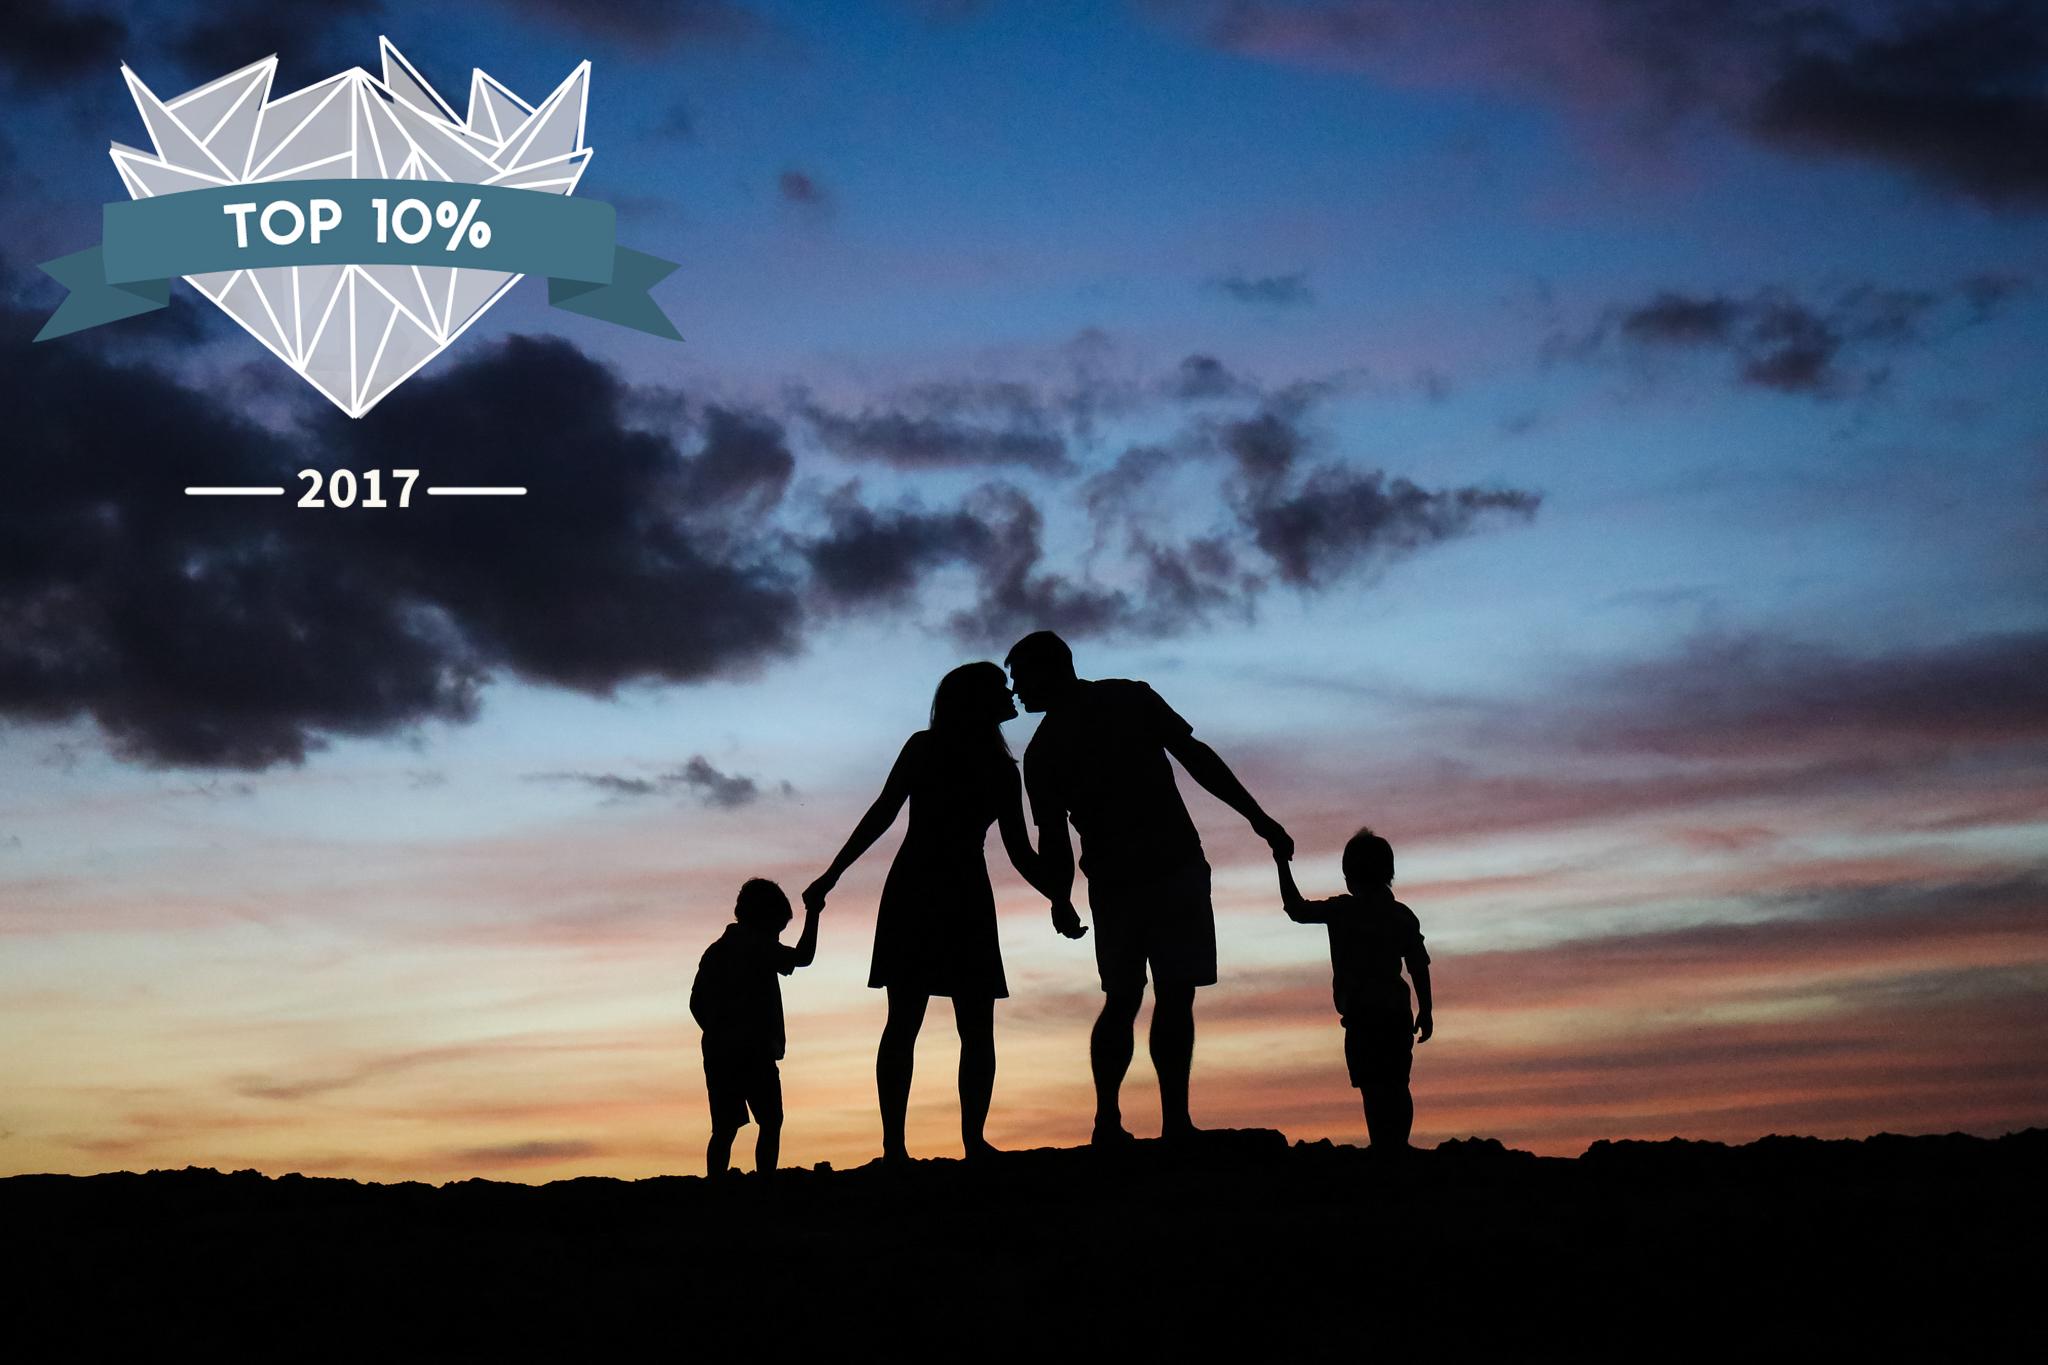 non watermarked 2017 shoot and share photo awards aloha sunshine photography 10November 06, 2016.jpg